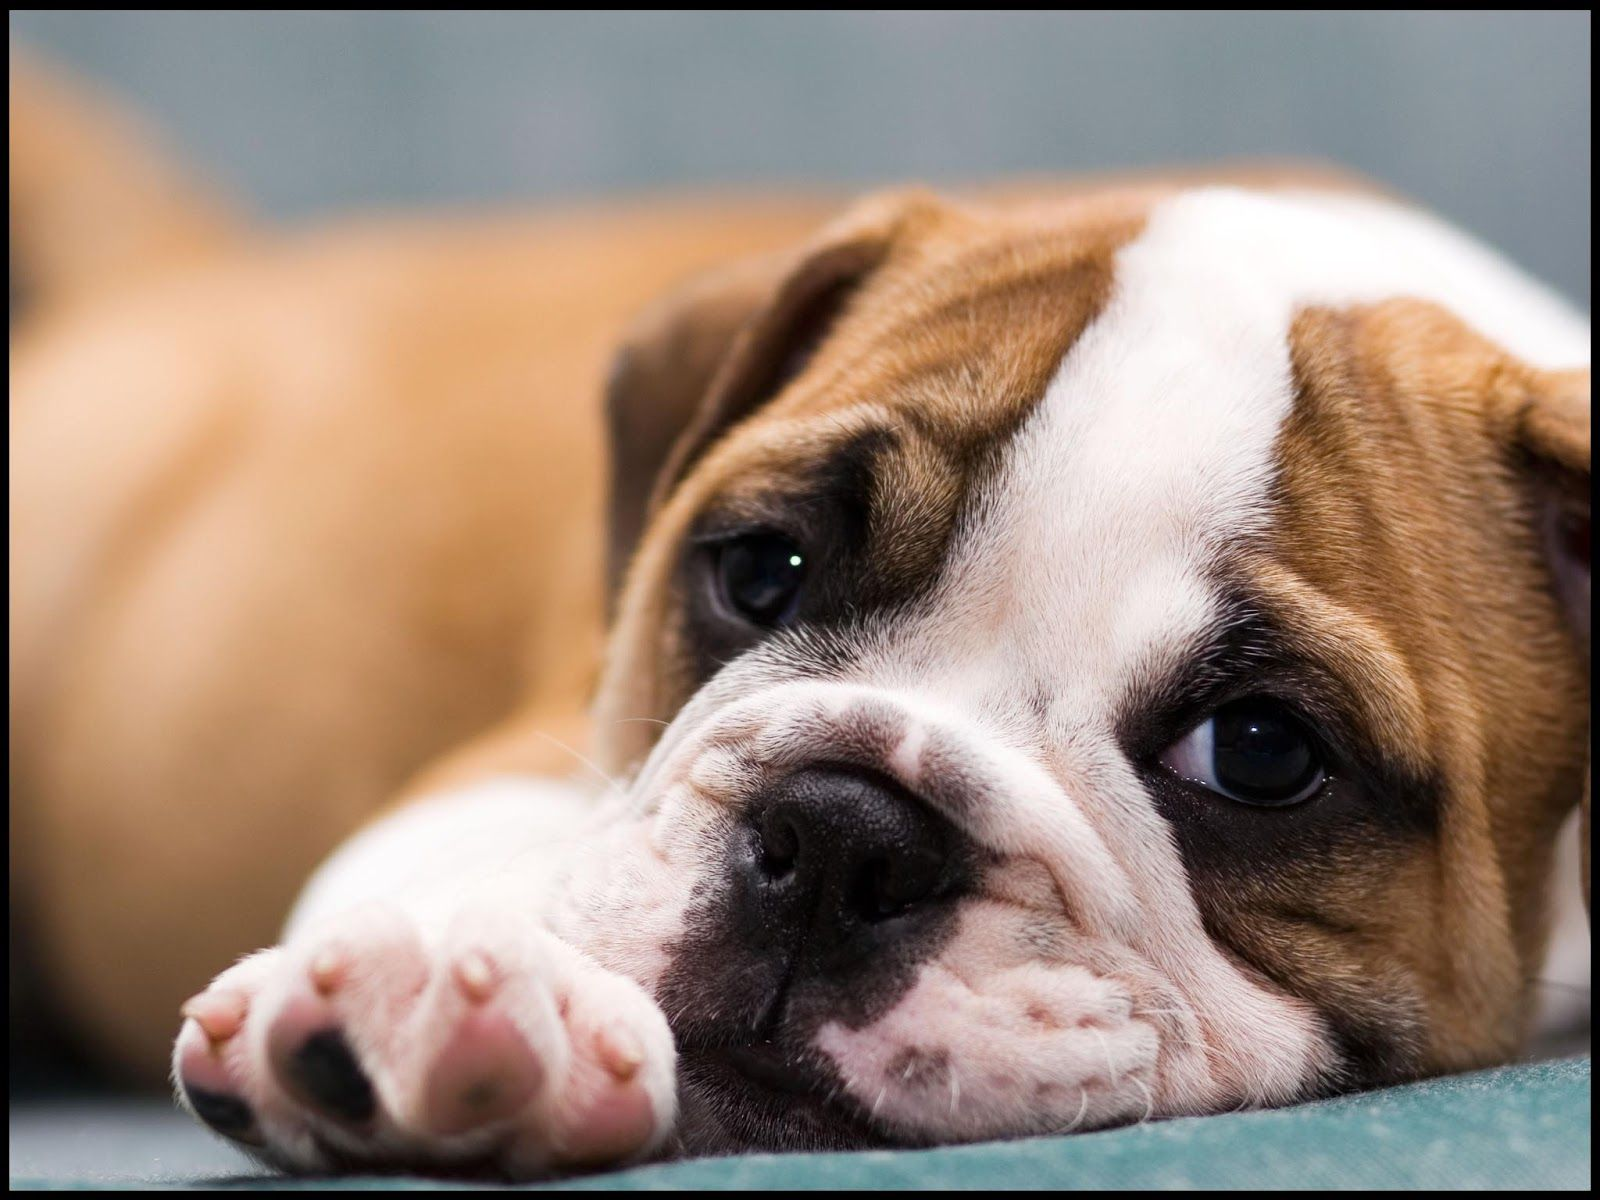 Cute French Bulldog Puppies Sleeping Hd Wallpaper And Download Bulldog Wallpaper Cute Bulldog Puppies Bulldog Puppies